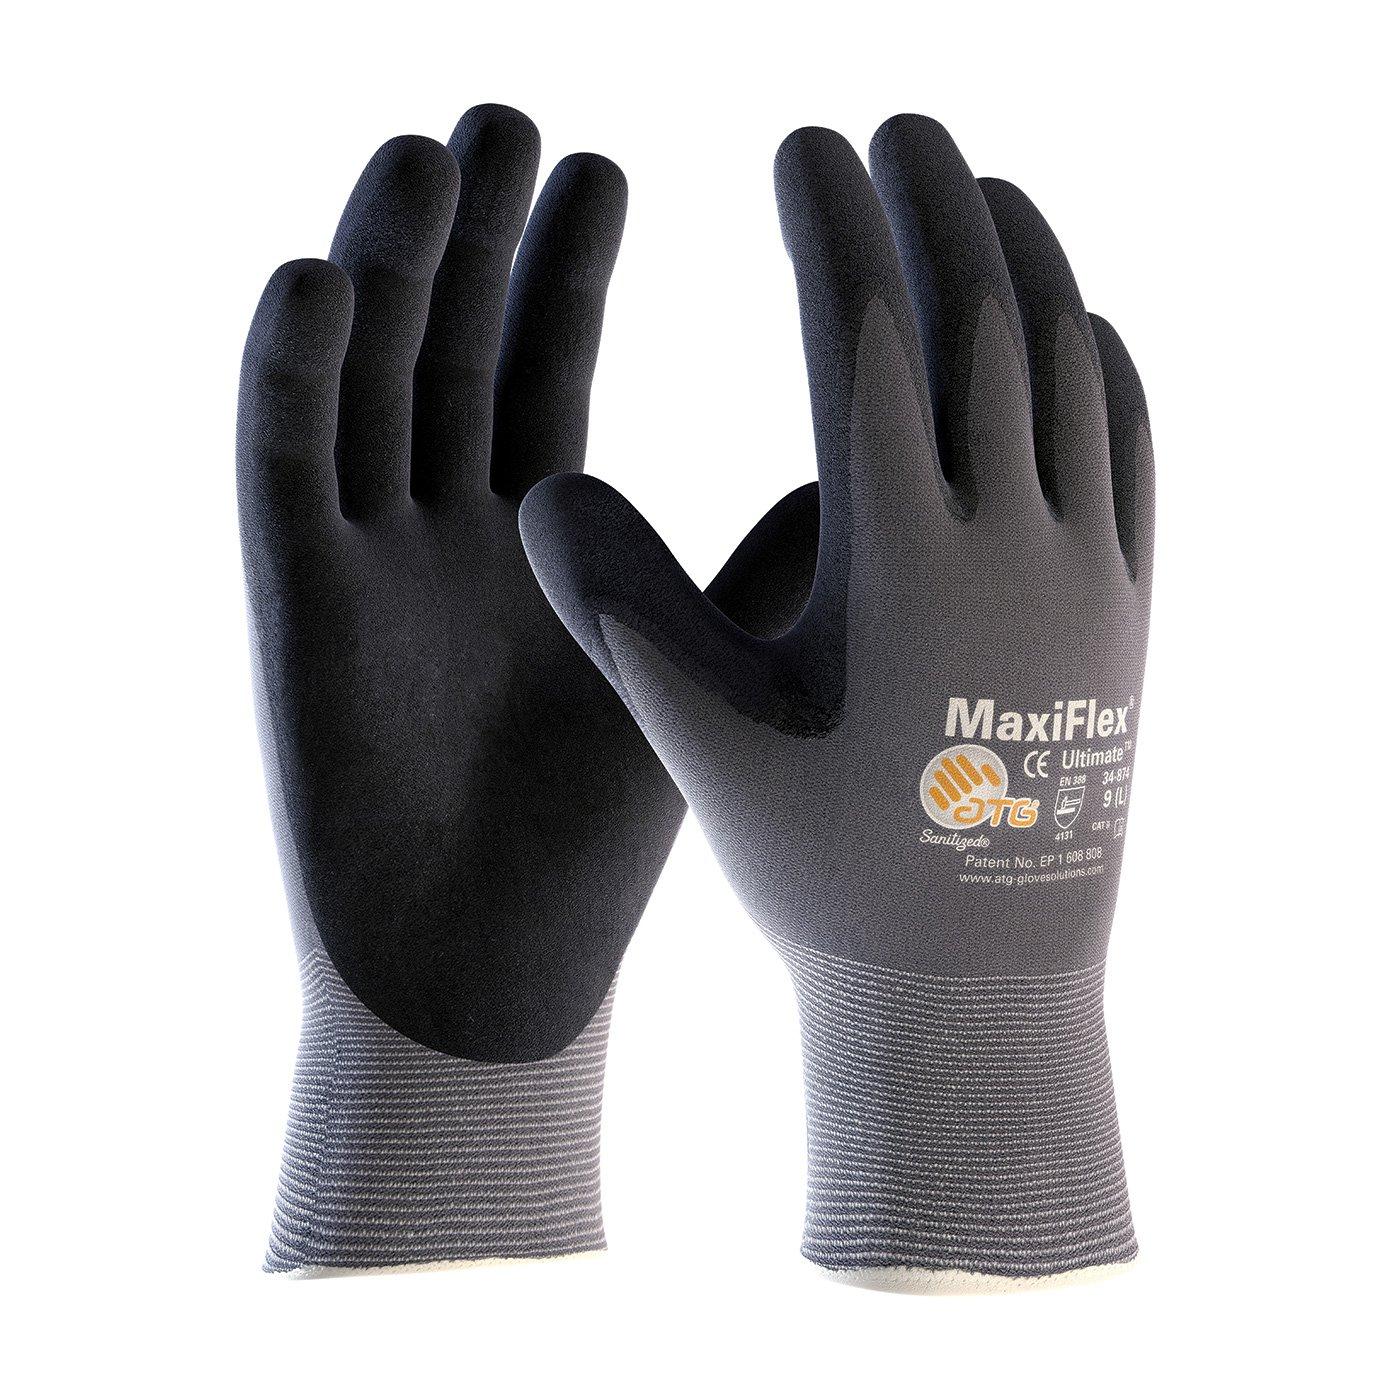 ATG 34-874/XL MaxiFlex Ultimate - Nylon, Micro-Foam Nitrile Grip Gloves - Black/Gray - X-Large - 12 Pair Per Pack by Maxiflex (Image #1)